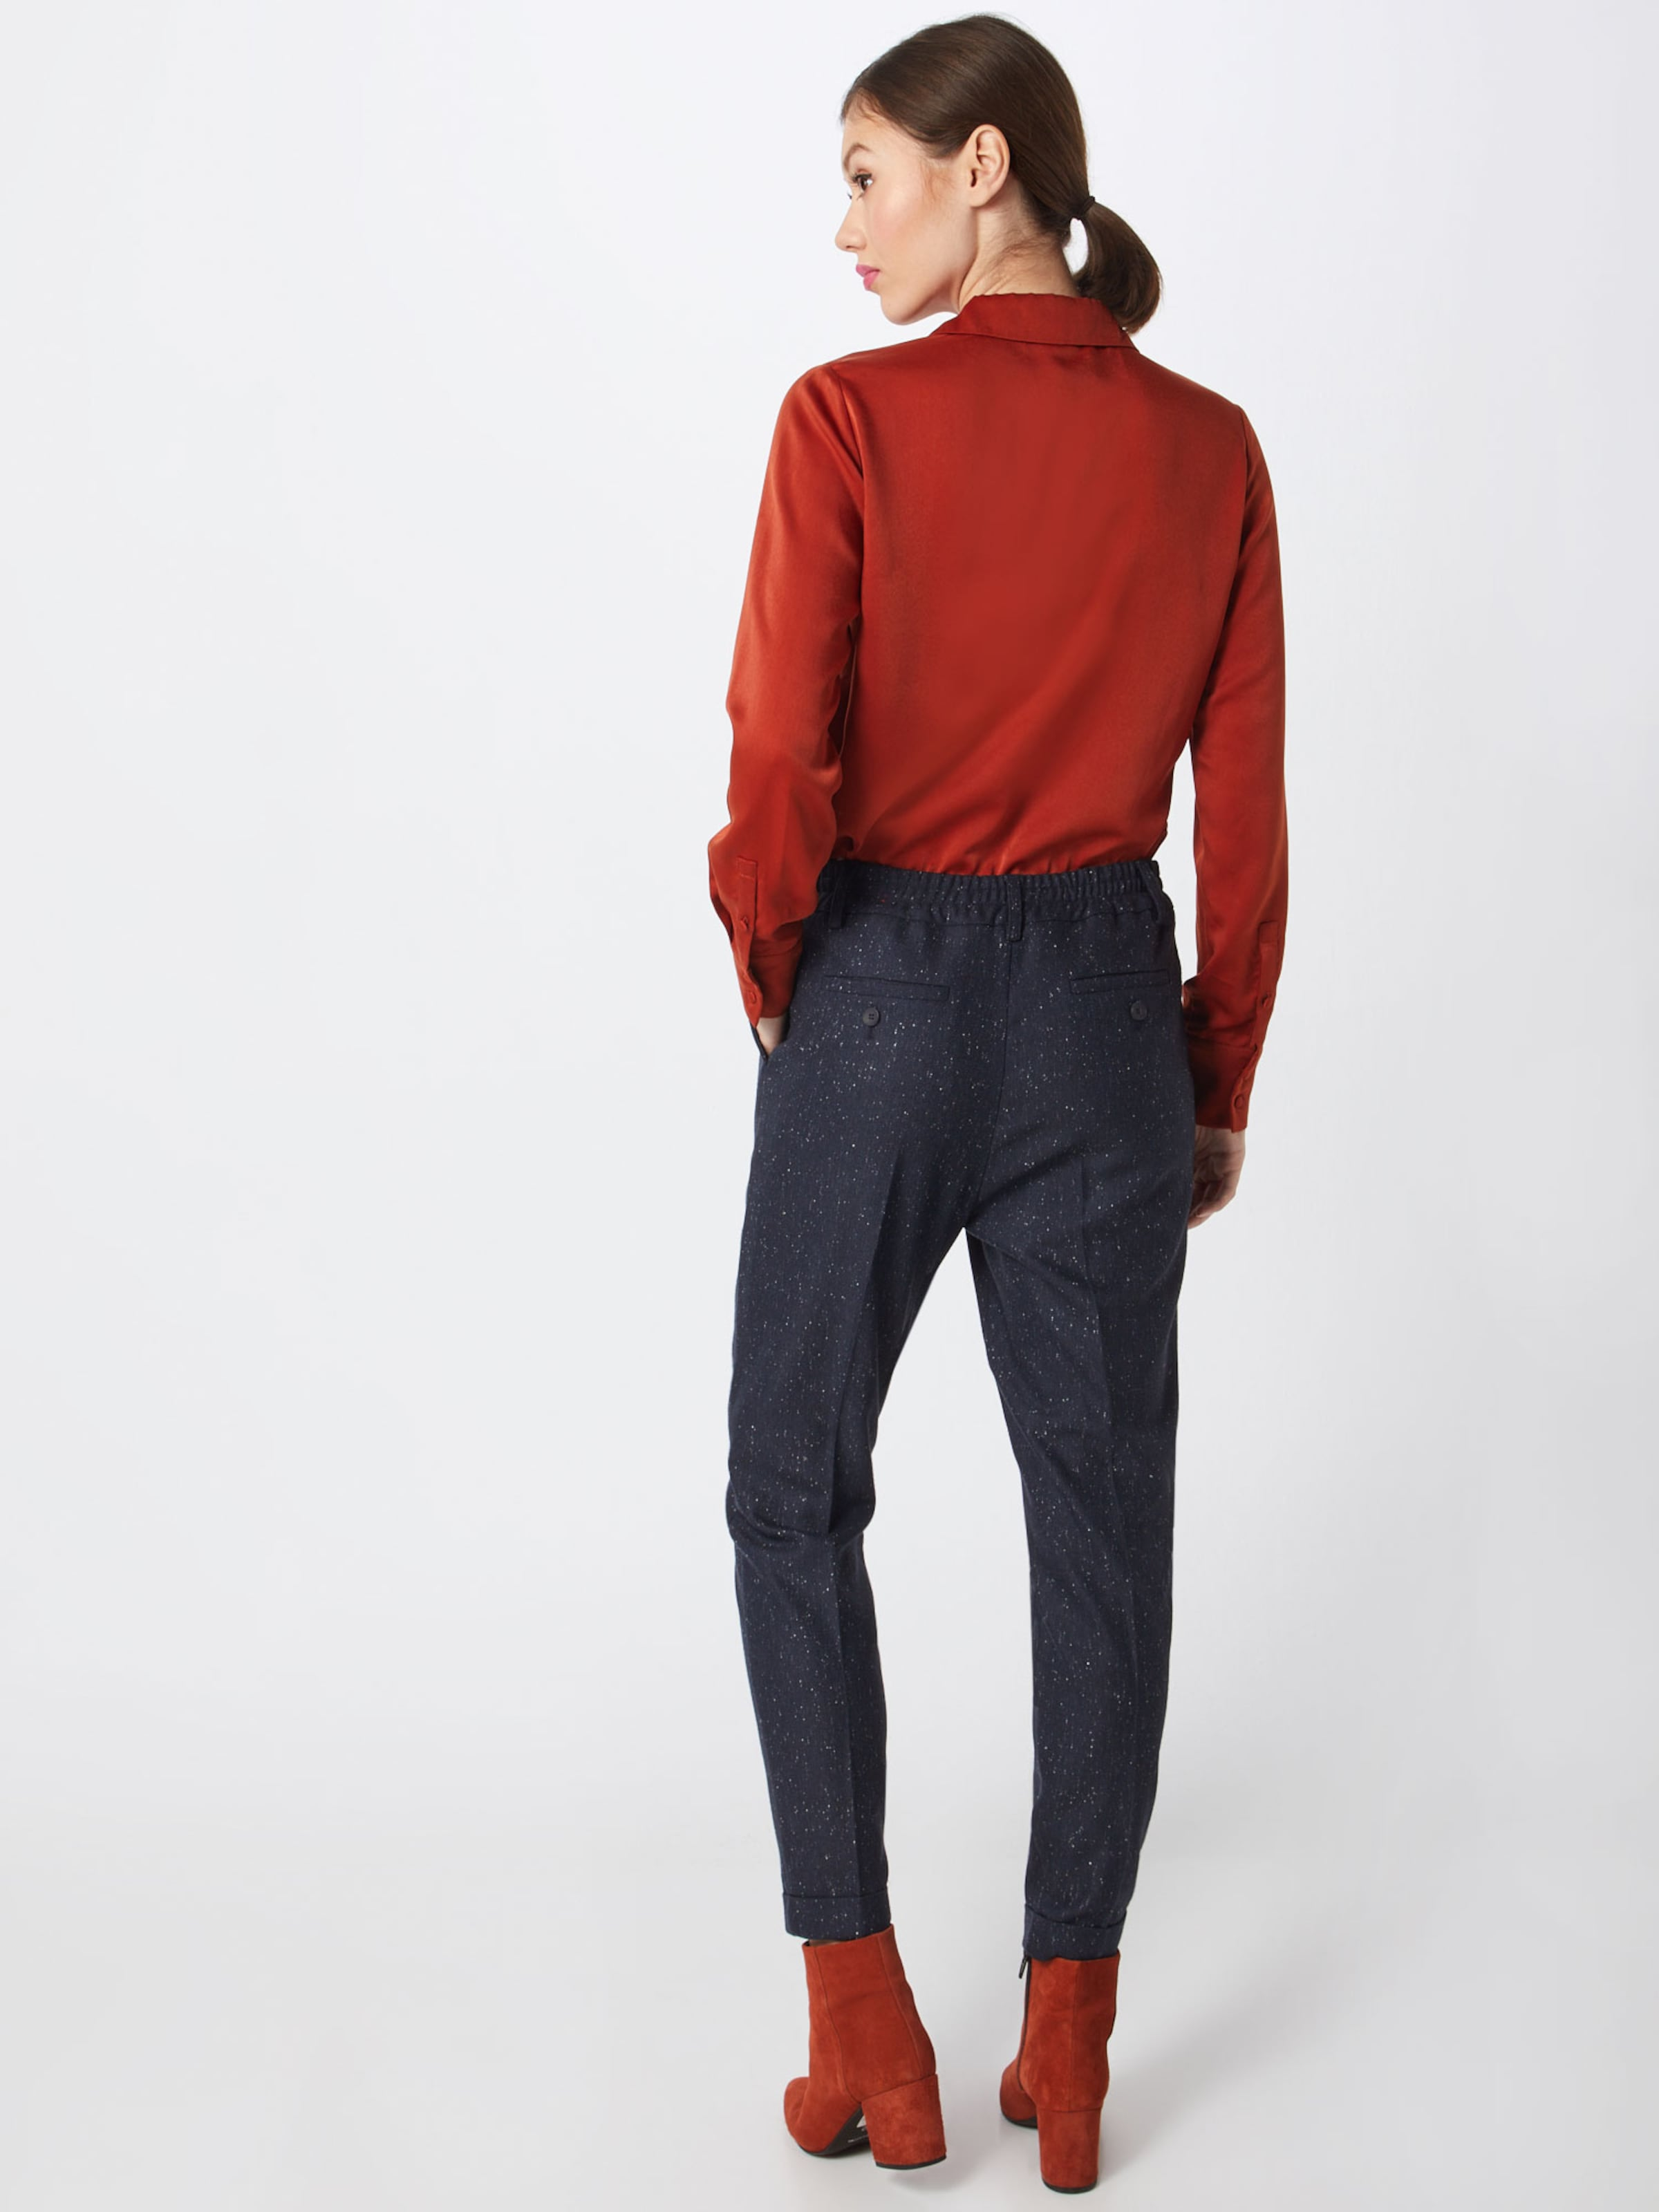 Pantalon En 'tweed chino' S Bleu Red Label oliver Plis Marine À dxoCreB